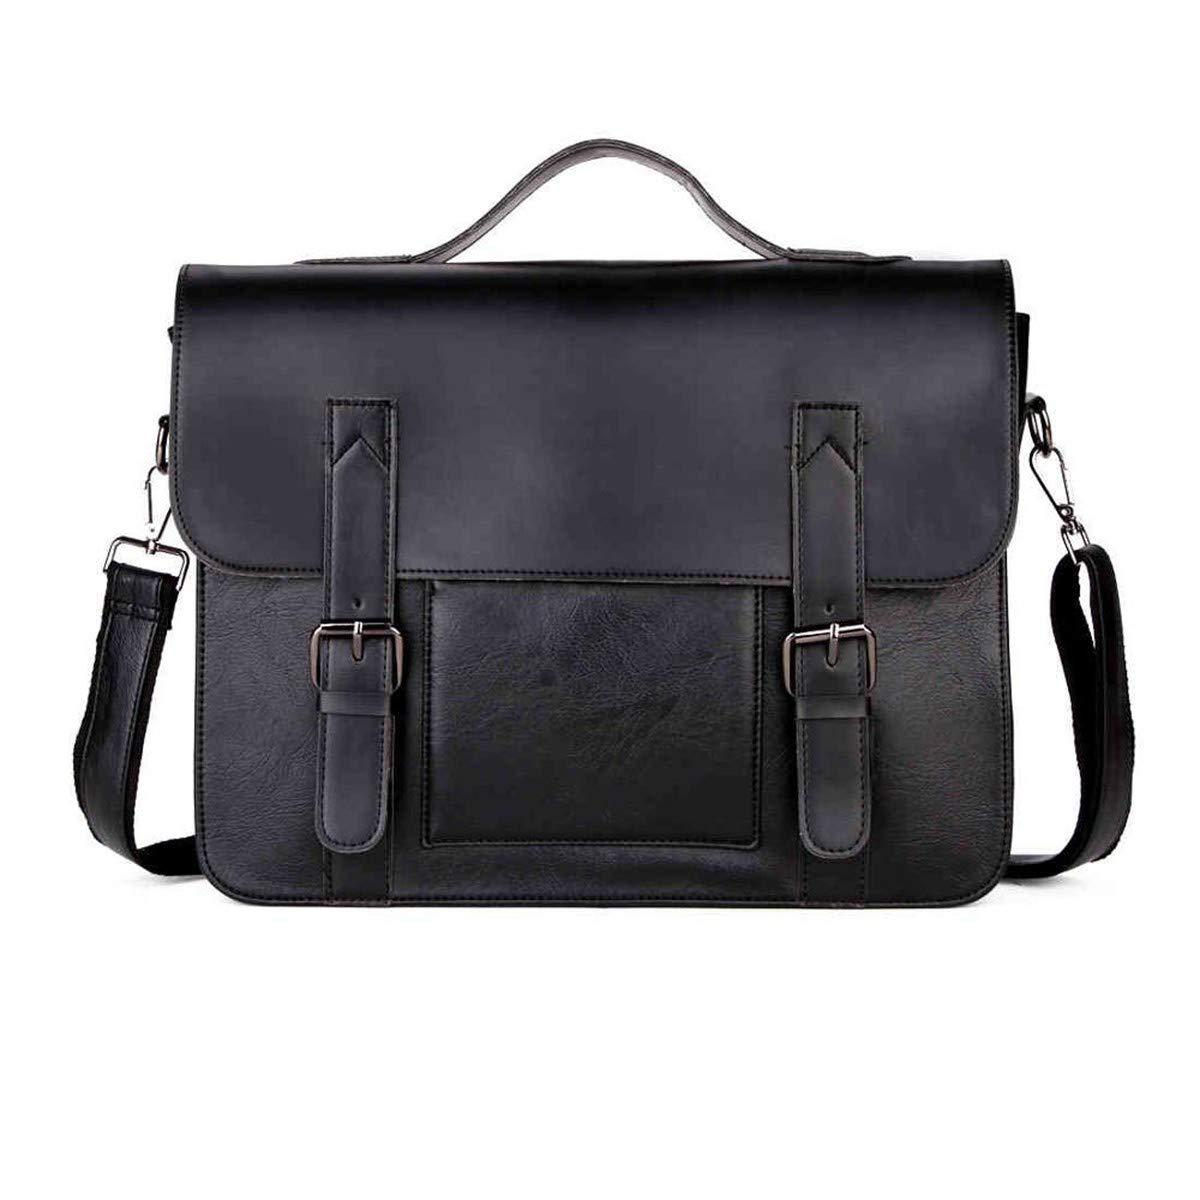 Lianai11 Laptoptasche Geschäft Herren Tasche Double Decor PU Herren Aktentasche Geschäft Casual Aktentasche